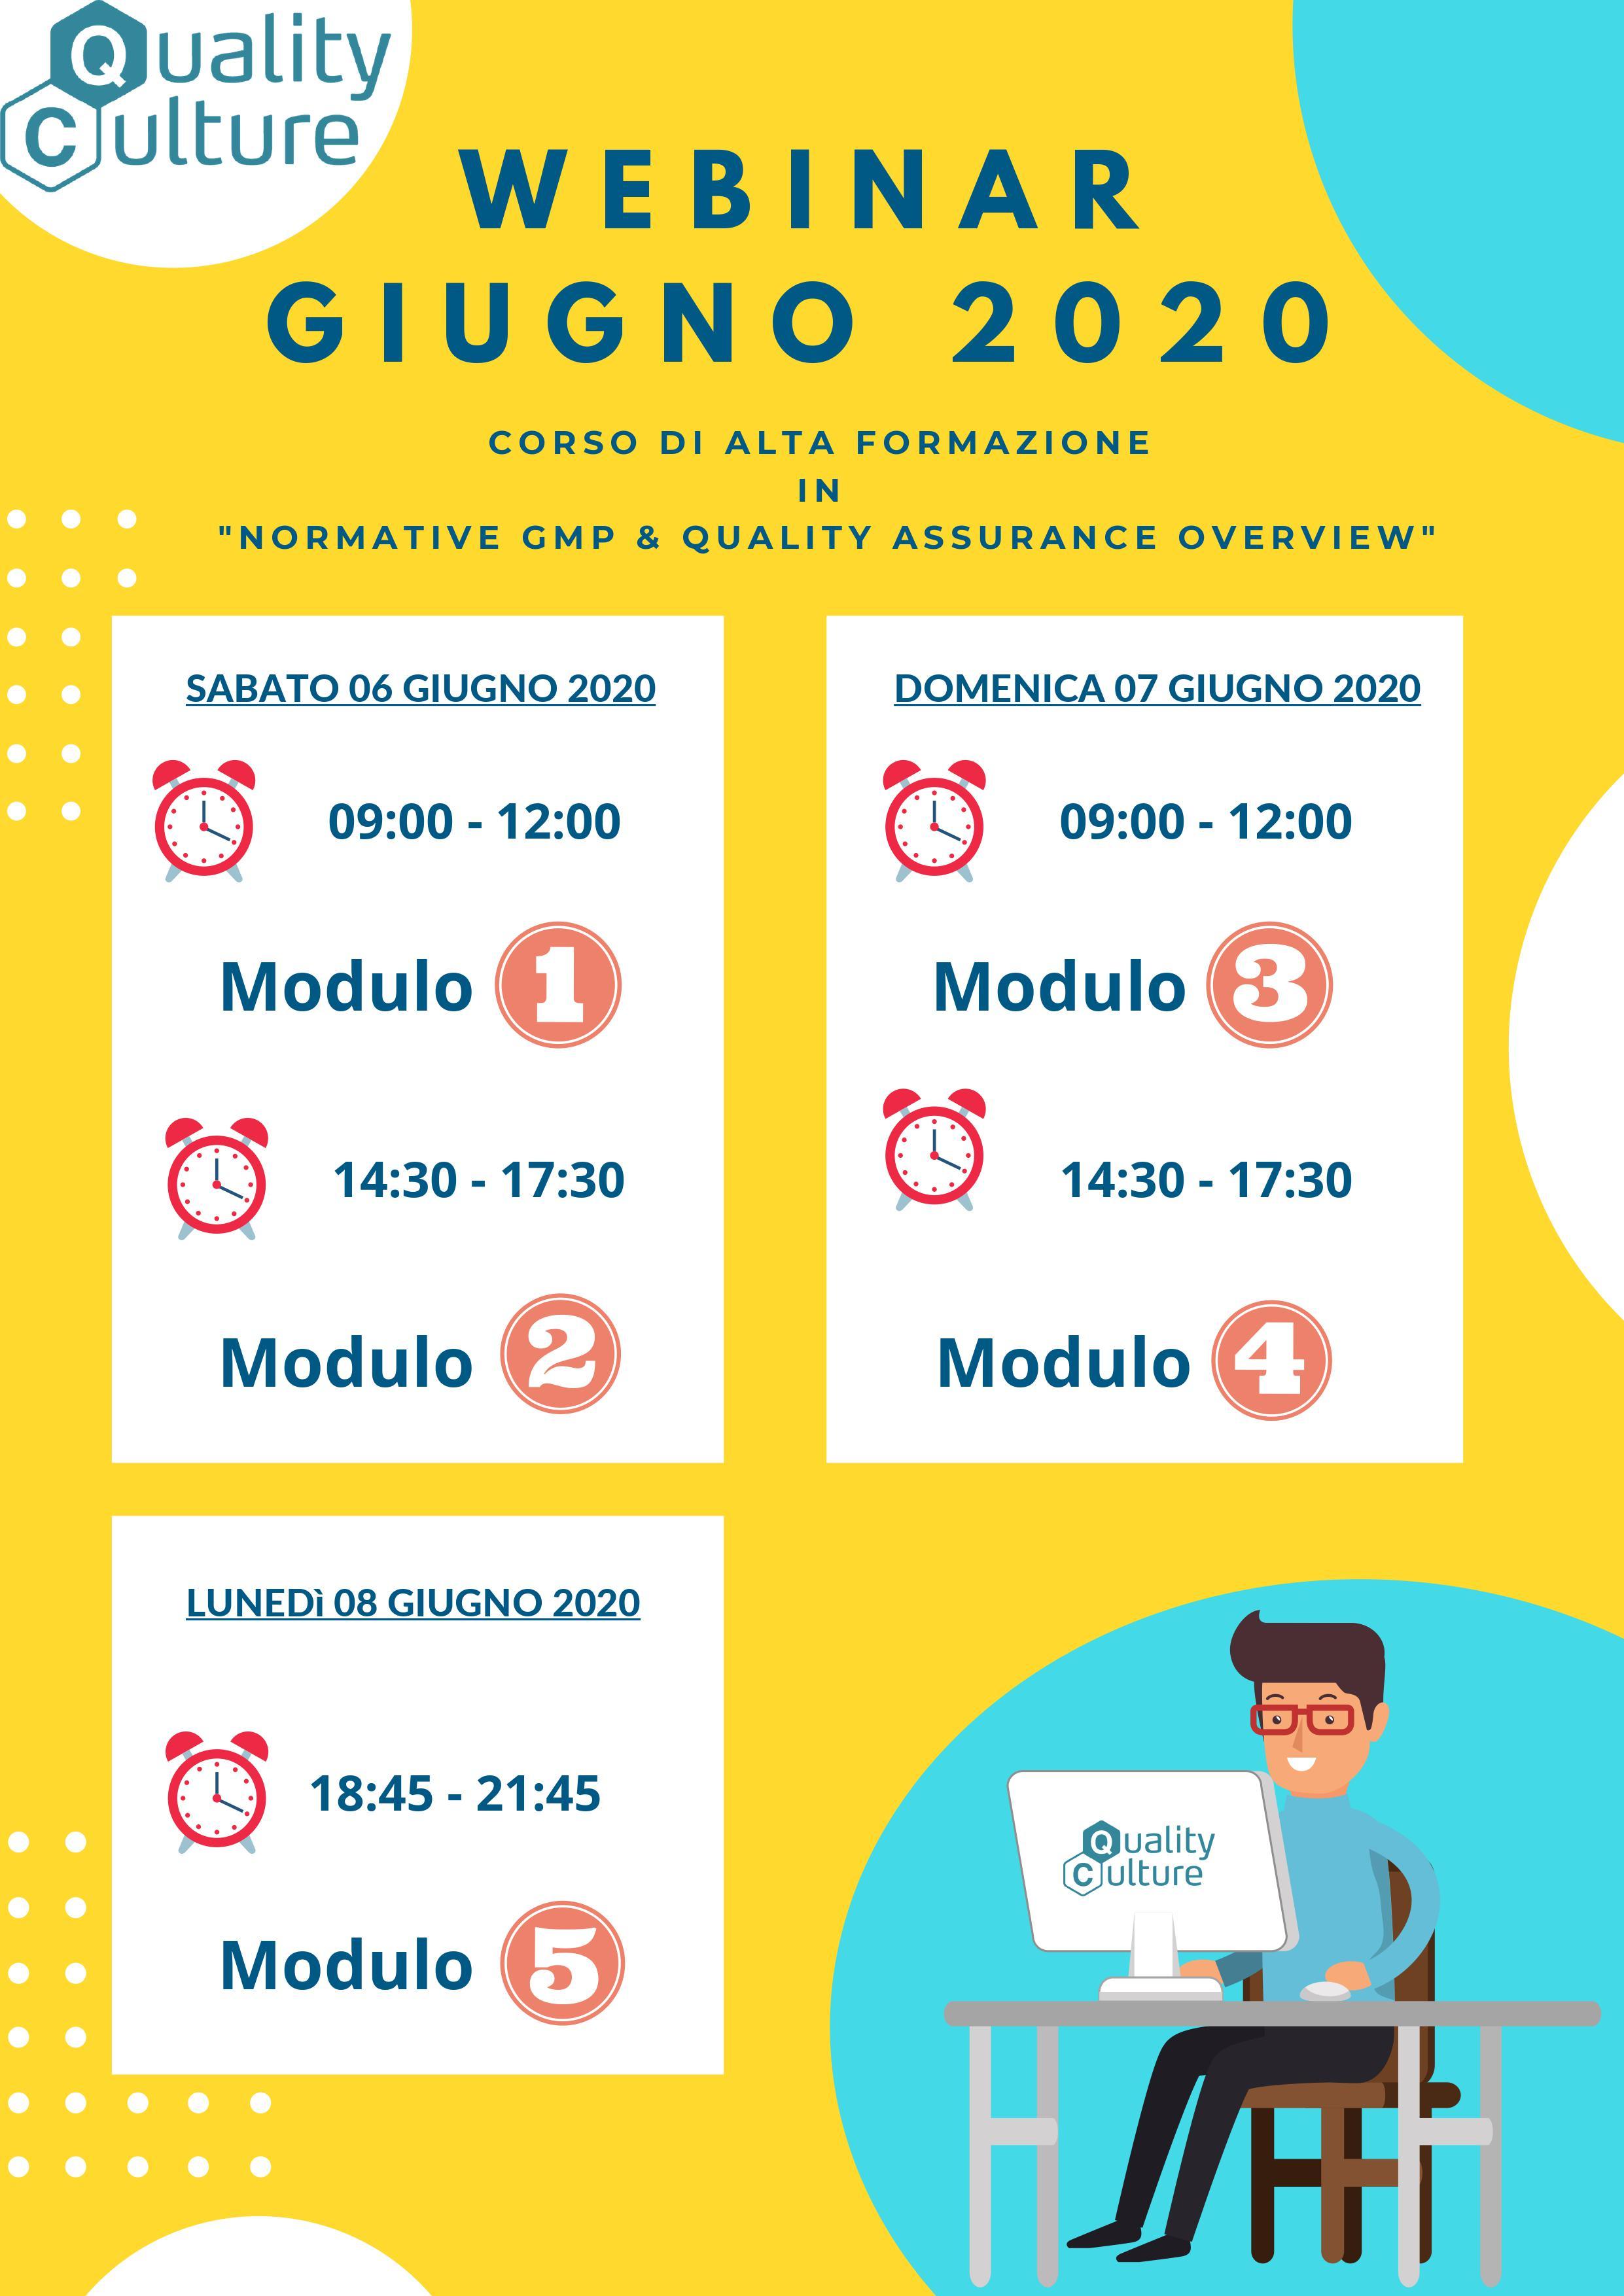 Planning Giugno 2020